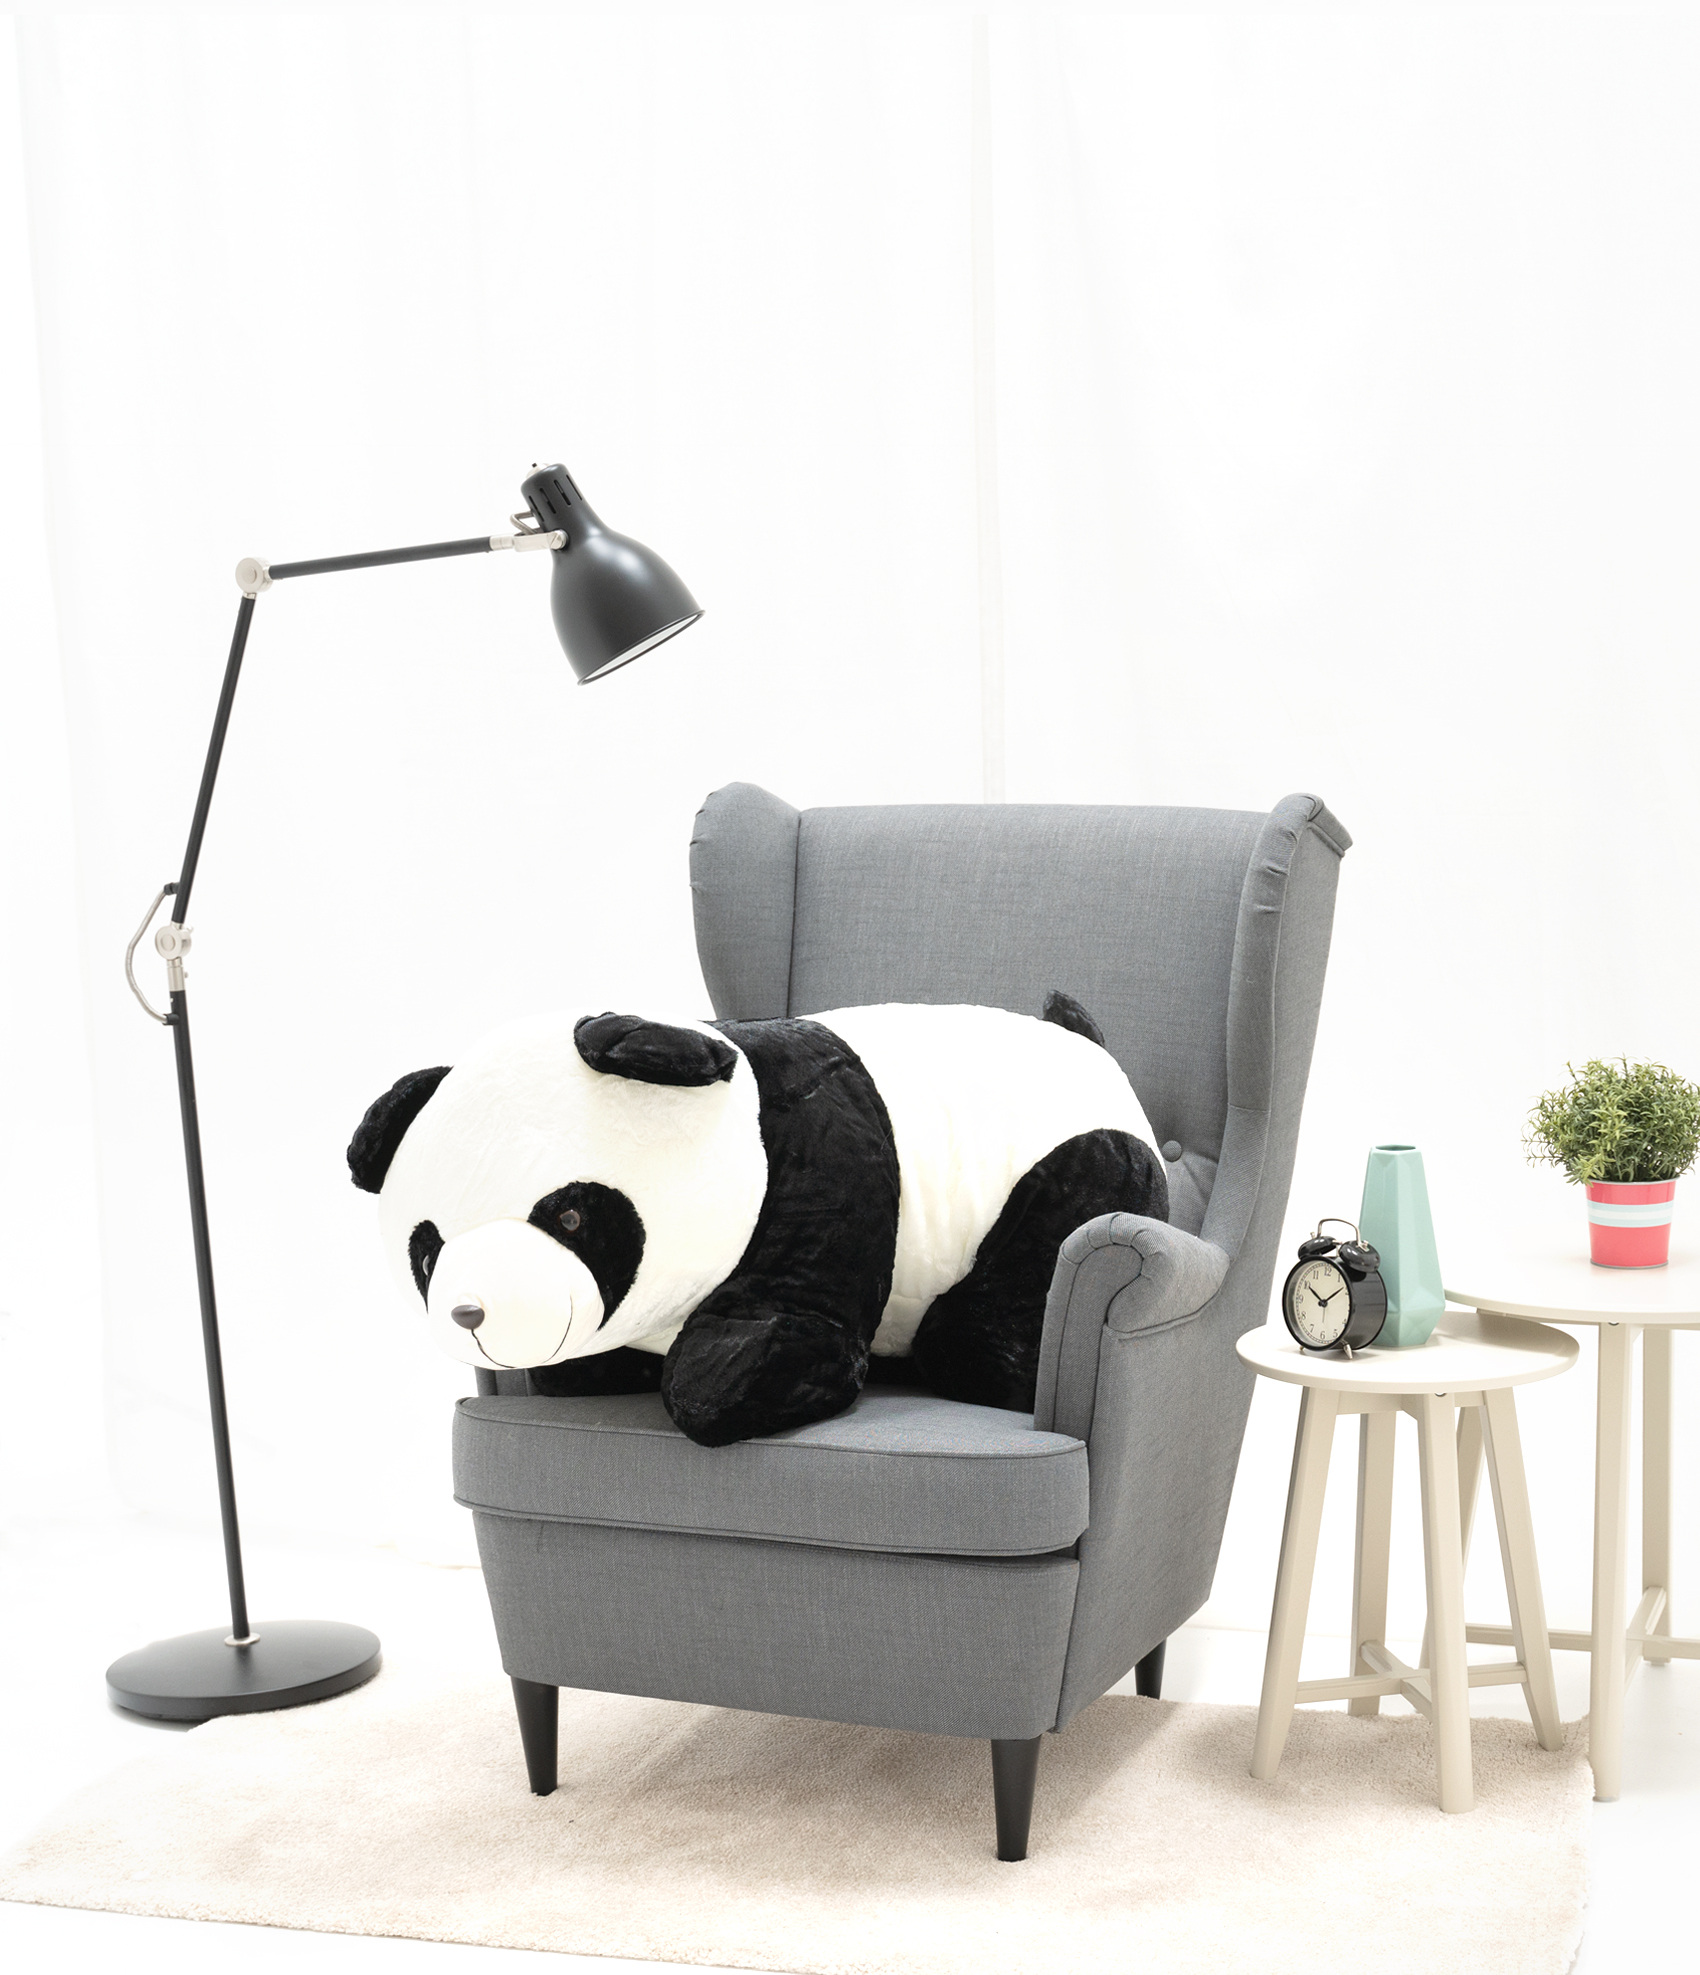 Panda lying